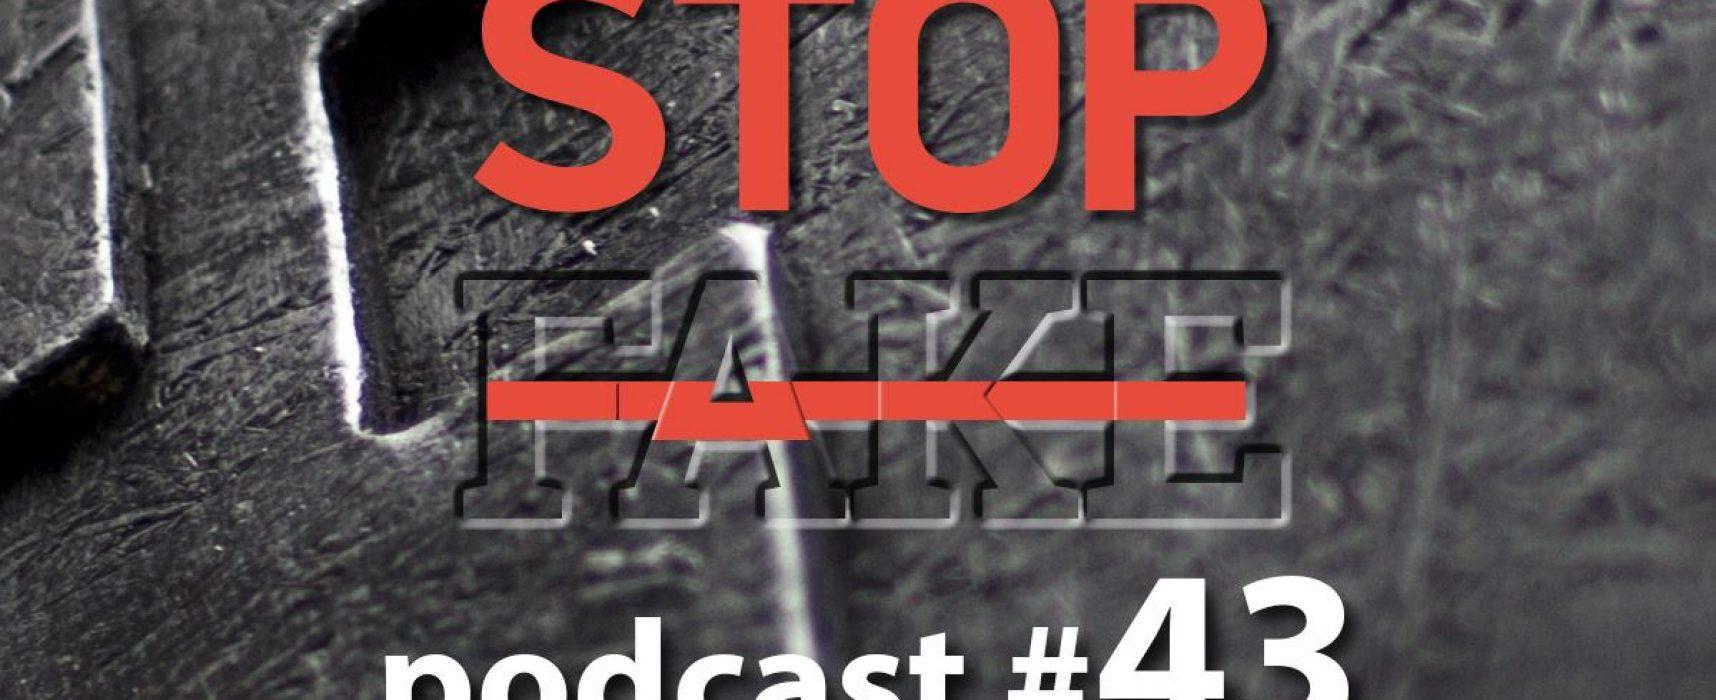 StopFake podcast # 43